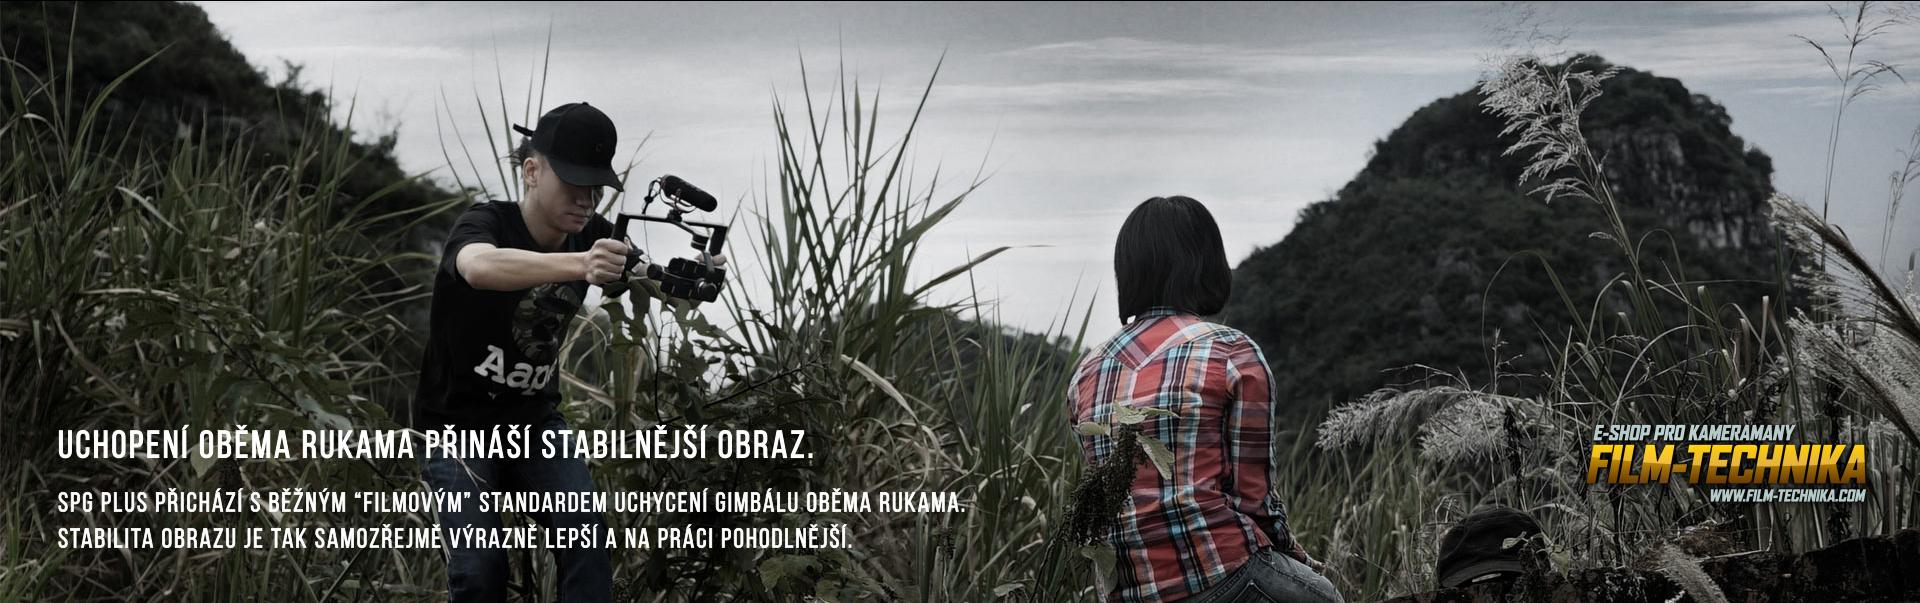 FEYIUTECH_SPG_filmtechnika